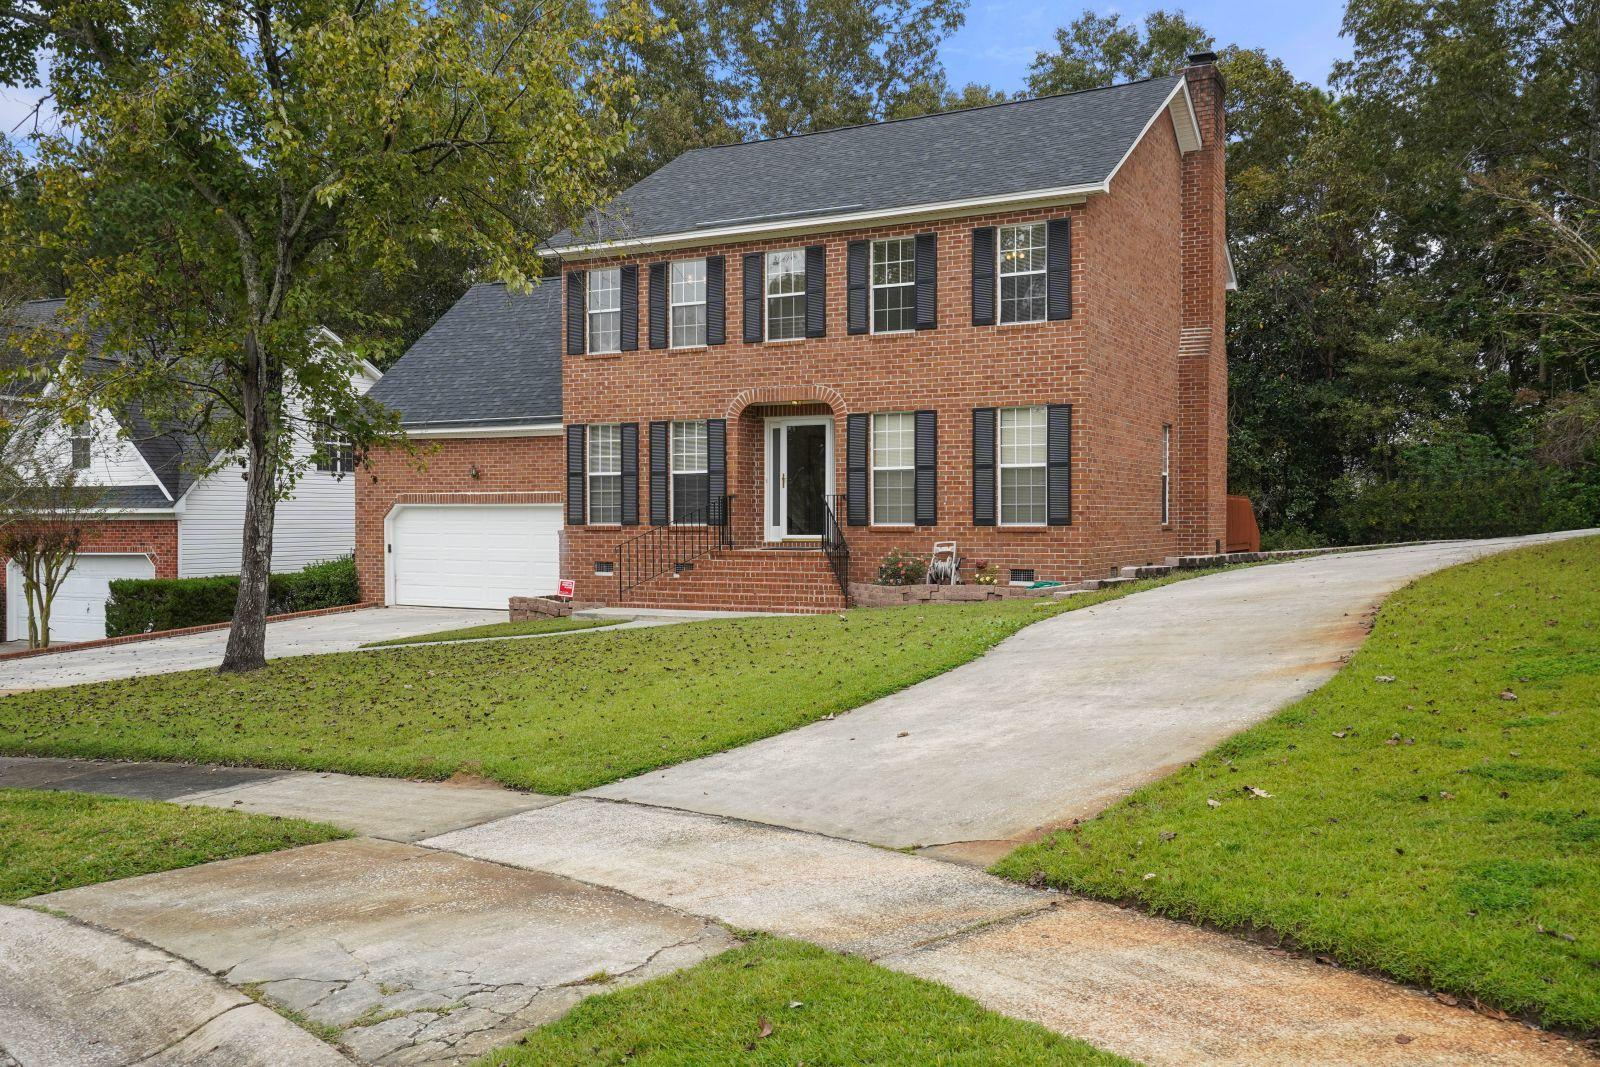 Crowfield Plantation Homes For Sale - 161 Belleplaine, Goose Creek, SC - 3